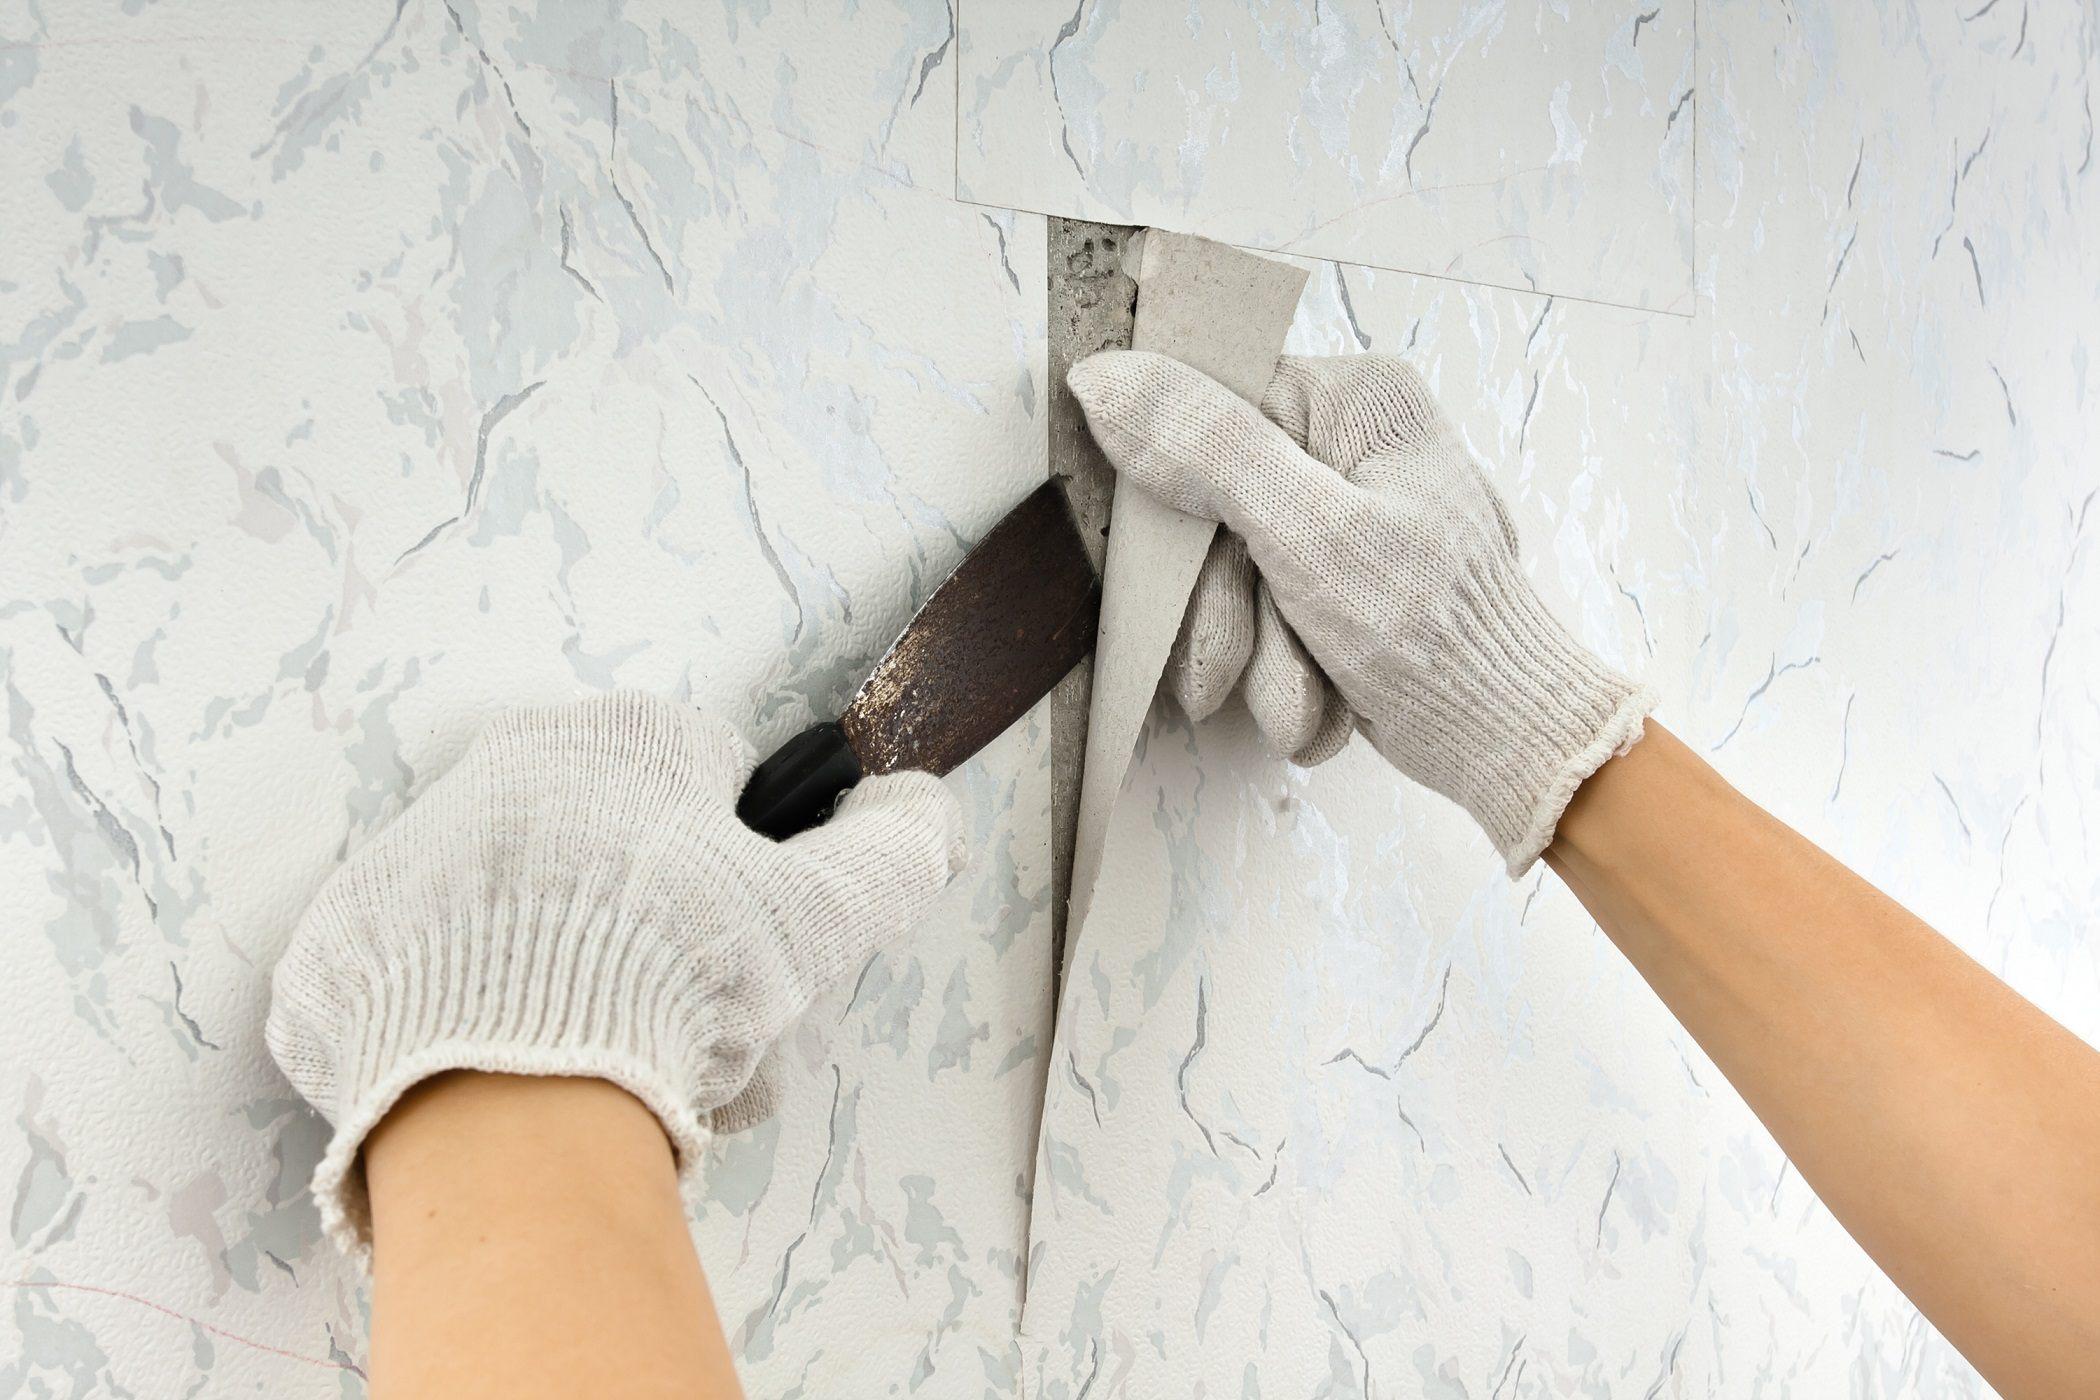 Removing wallpaper